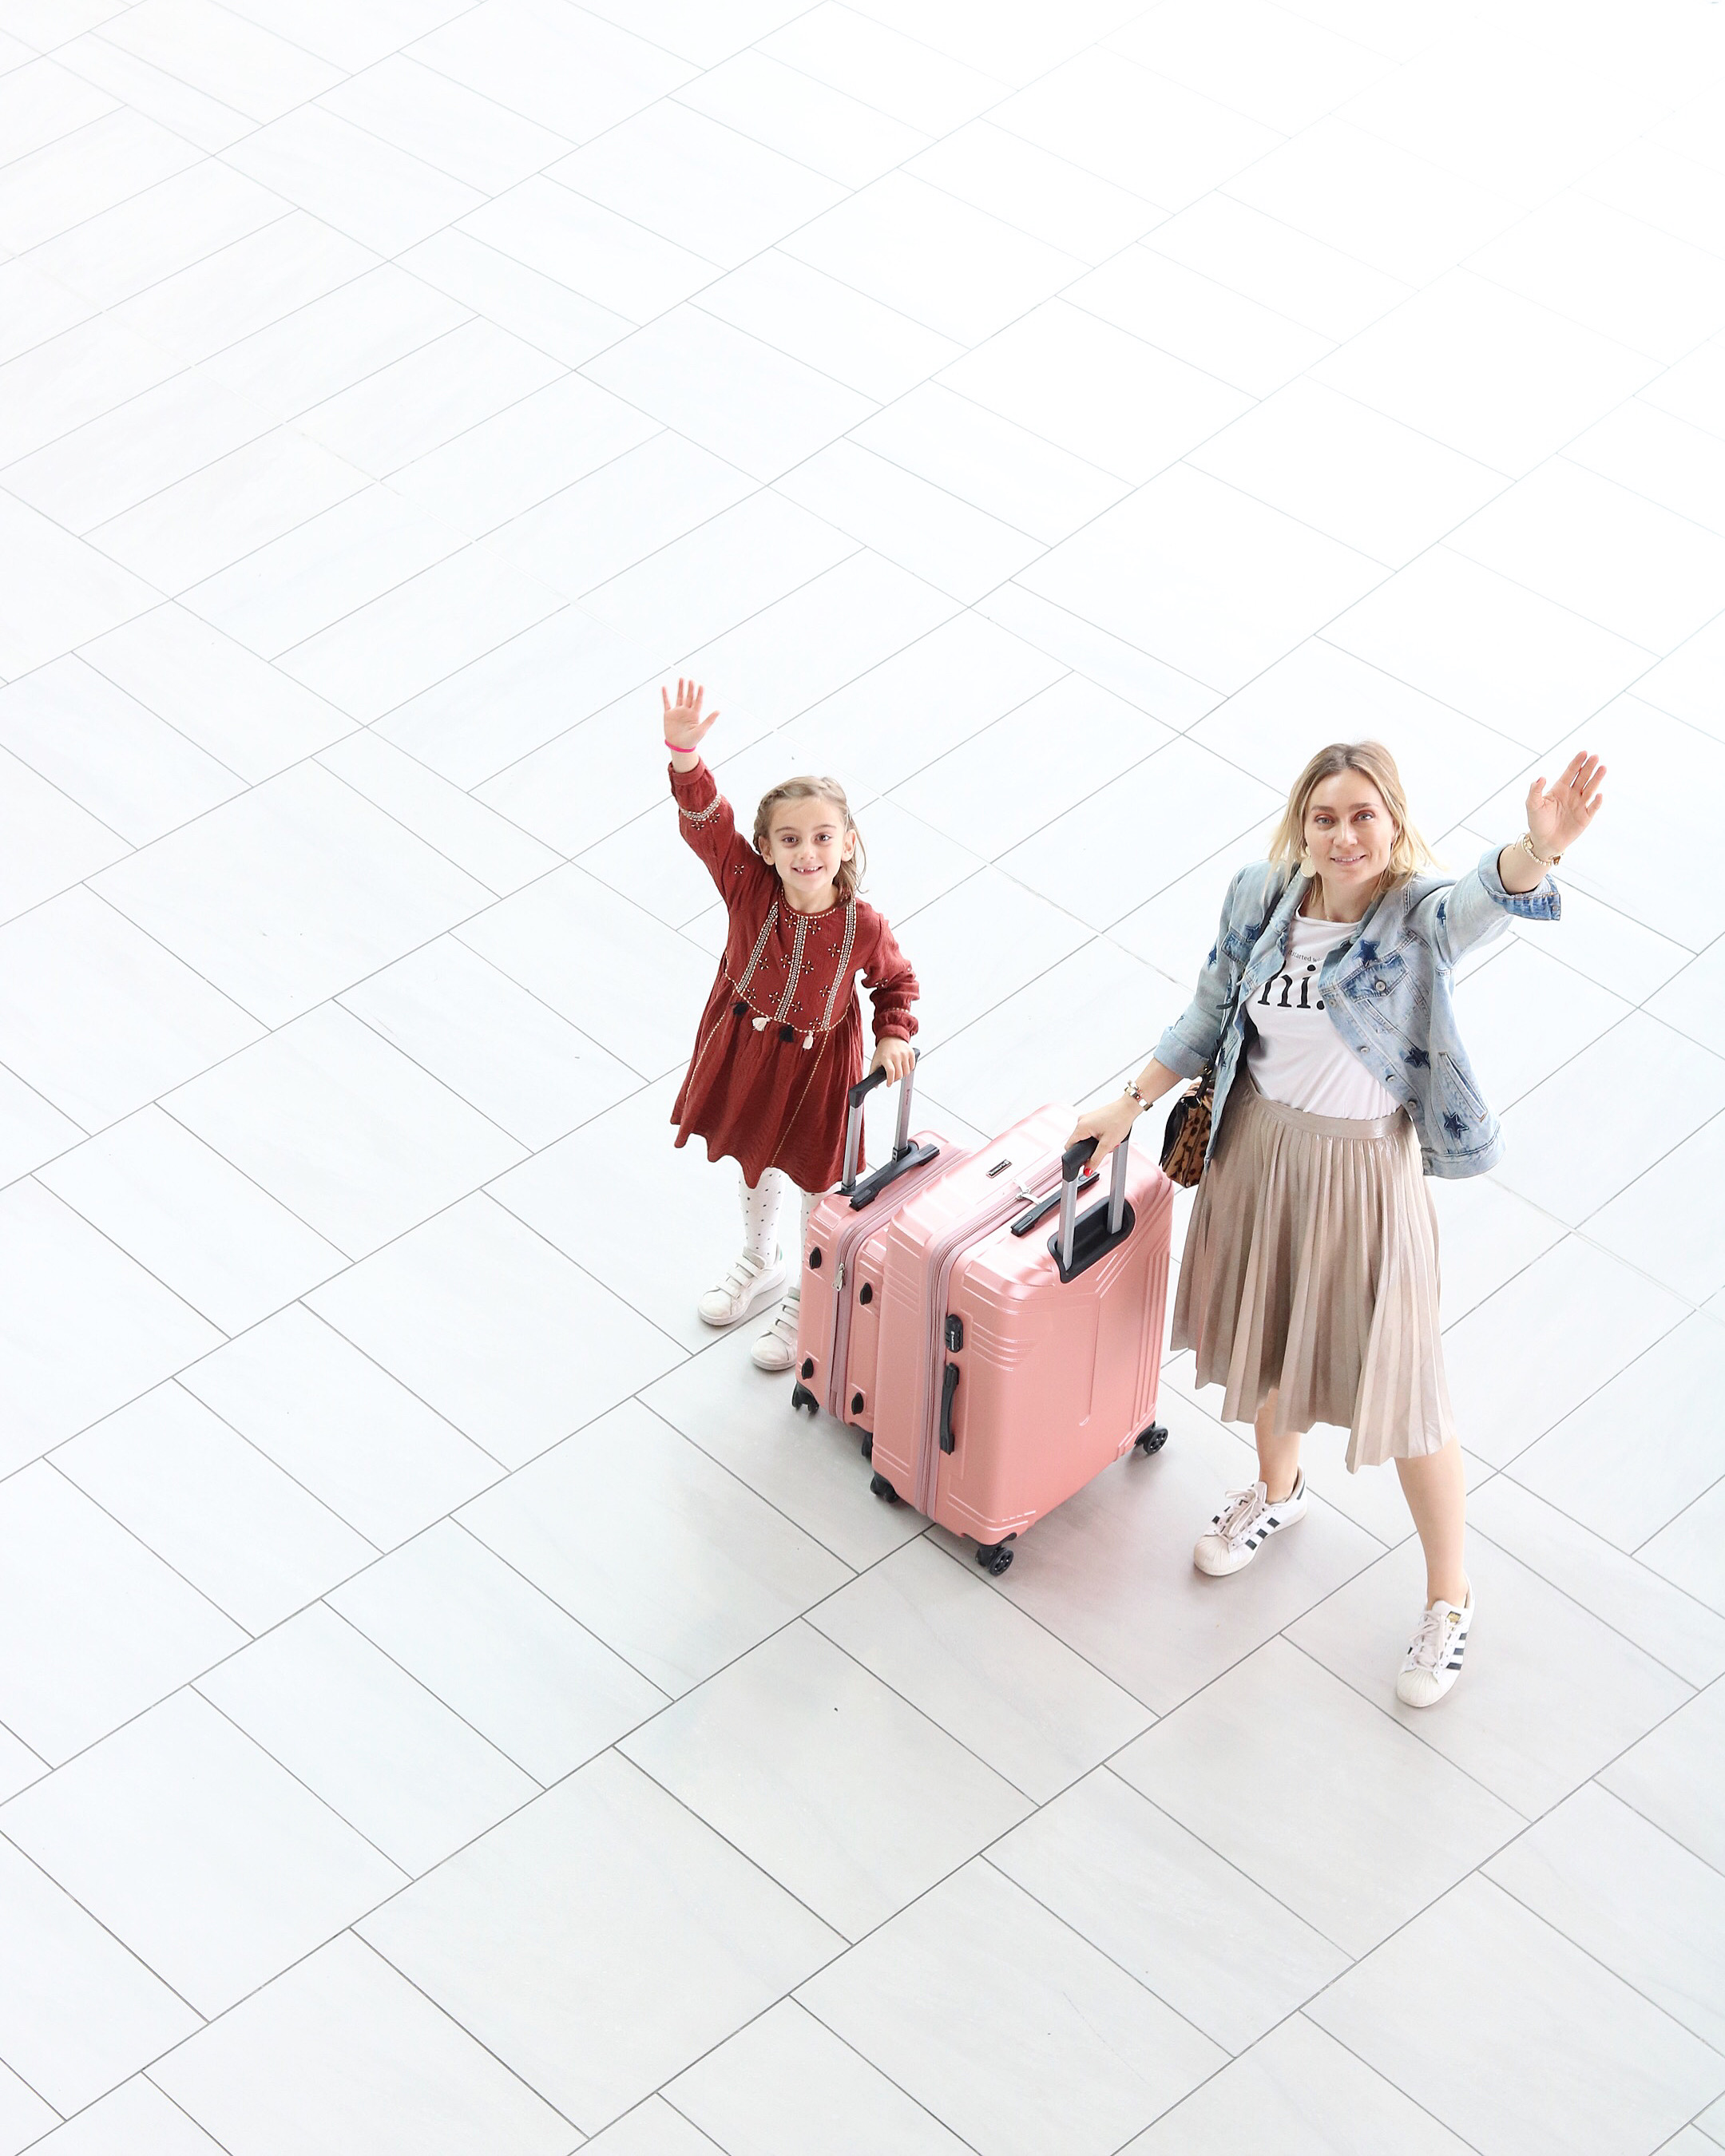 voyage-famille-lyon-aeroport-saint-exupery